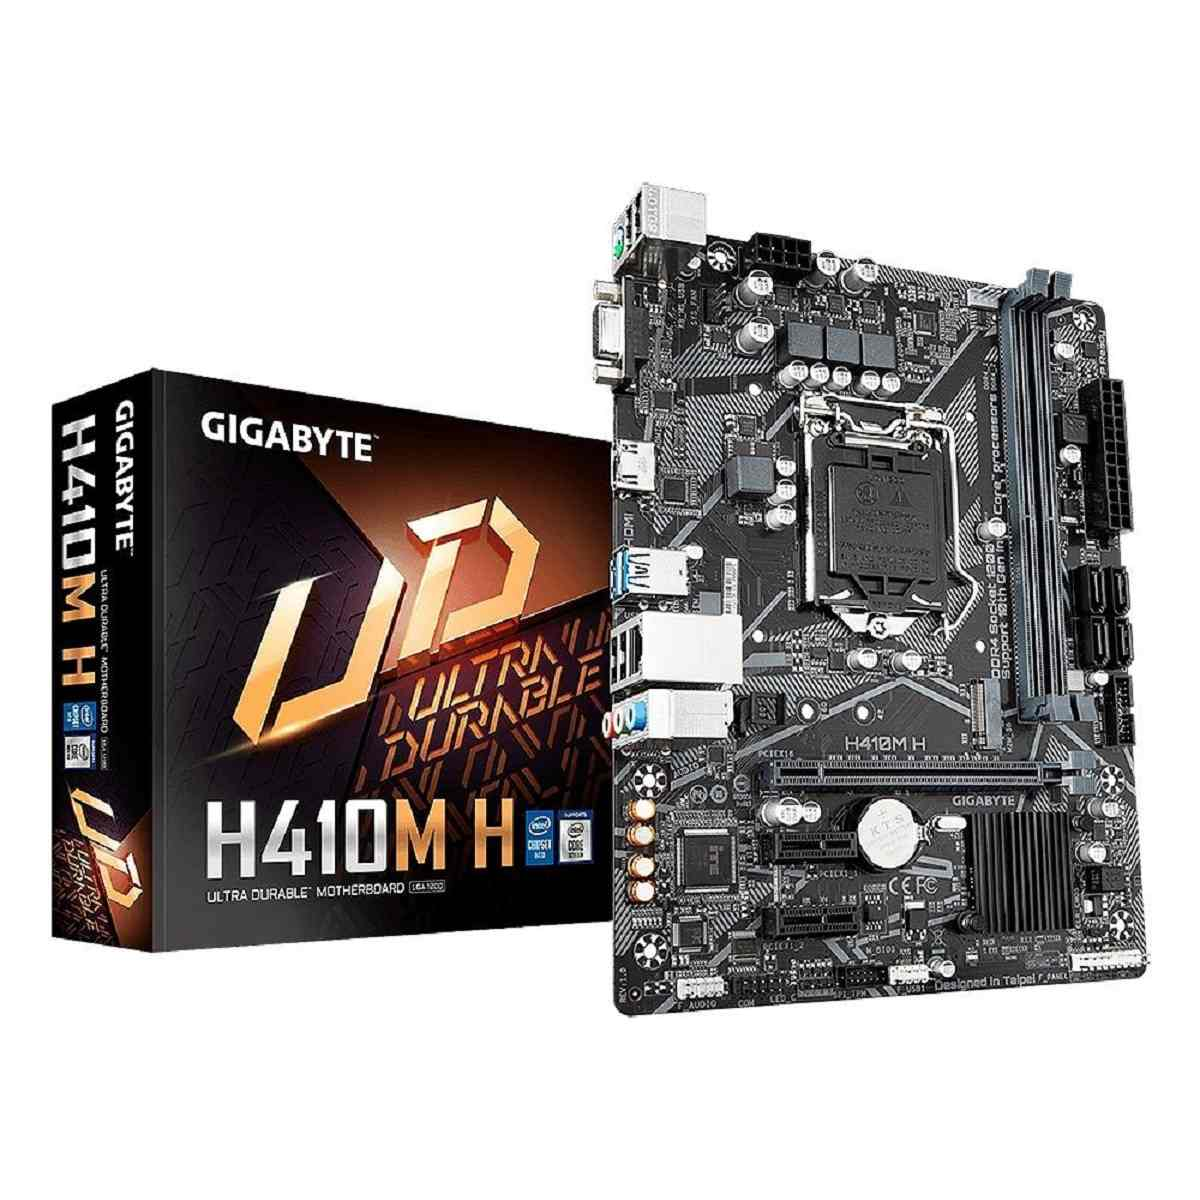 PLACA MAE GIGABYTE H410M H DDR4 SOCKET LGA1200 CHIPSET INTEL H410